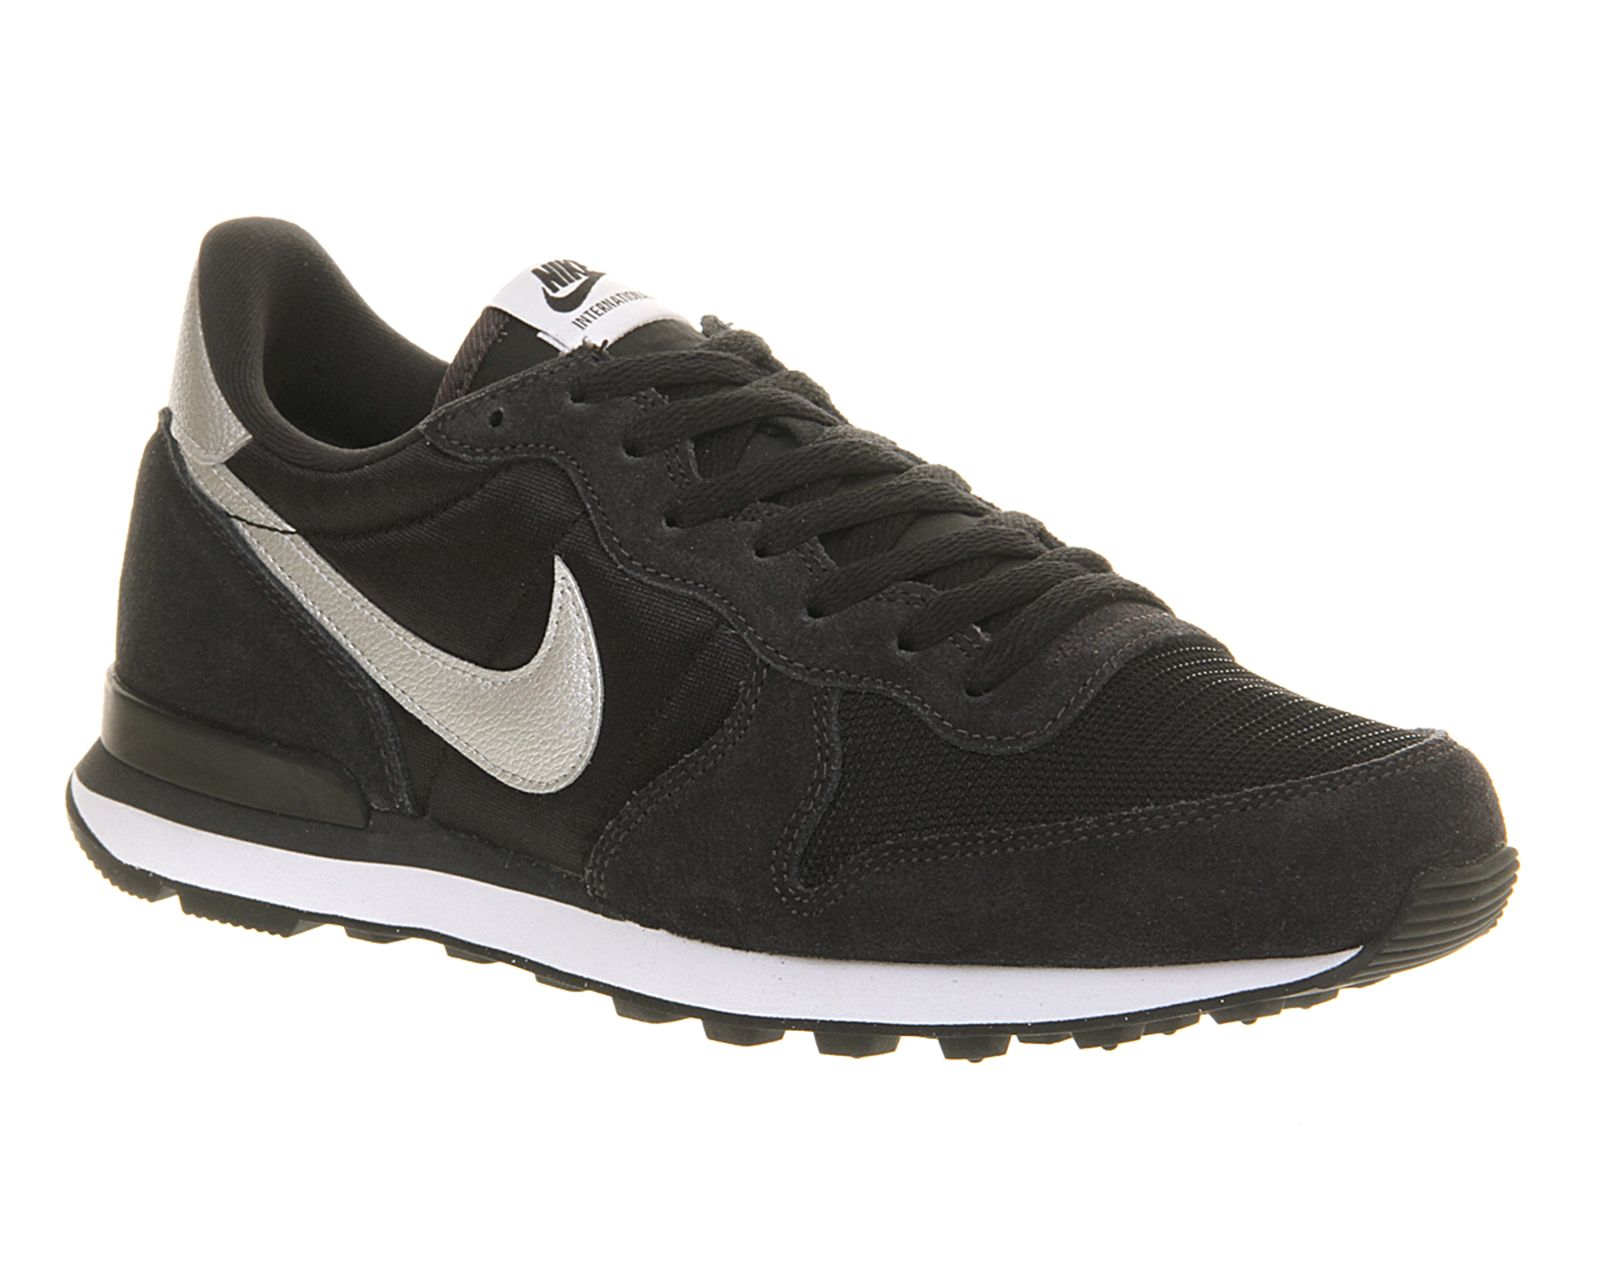 nike lunettes de réparation - 1000+ images about Sneakers on Pinterest | Nike Air Pegasus, Nike ...